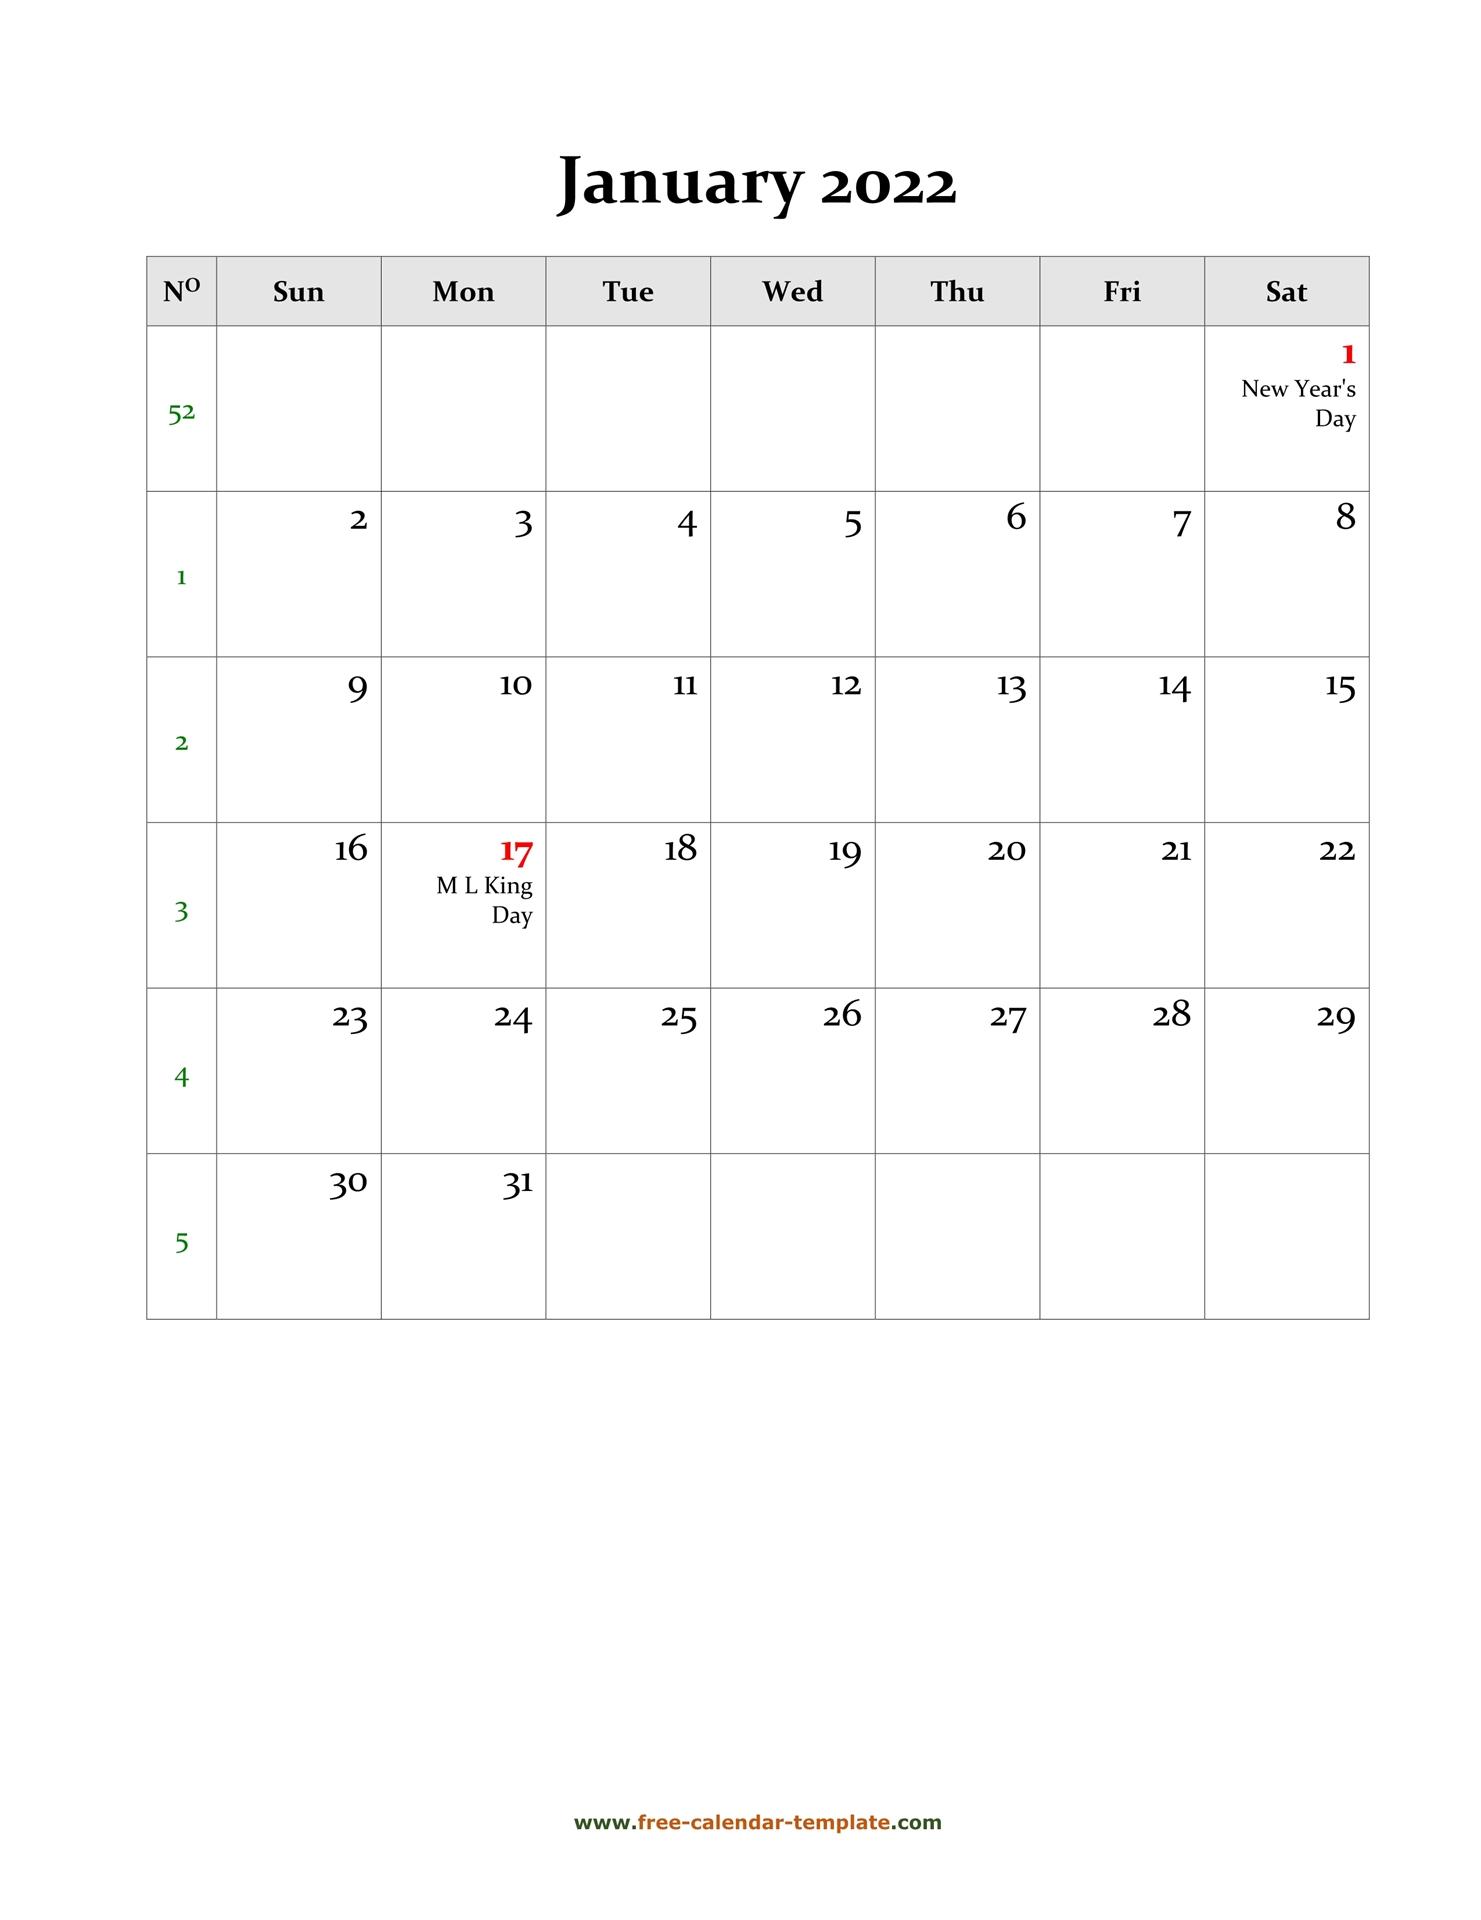 January 2022 Free Calendar Tempplate | Free Calendar For 2022 January Blank Calendar